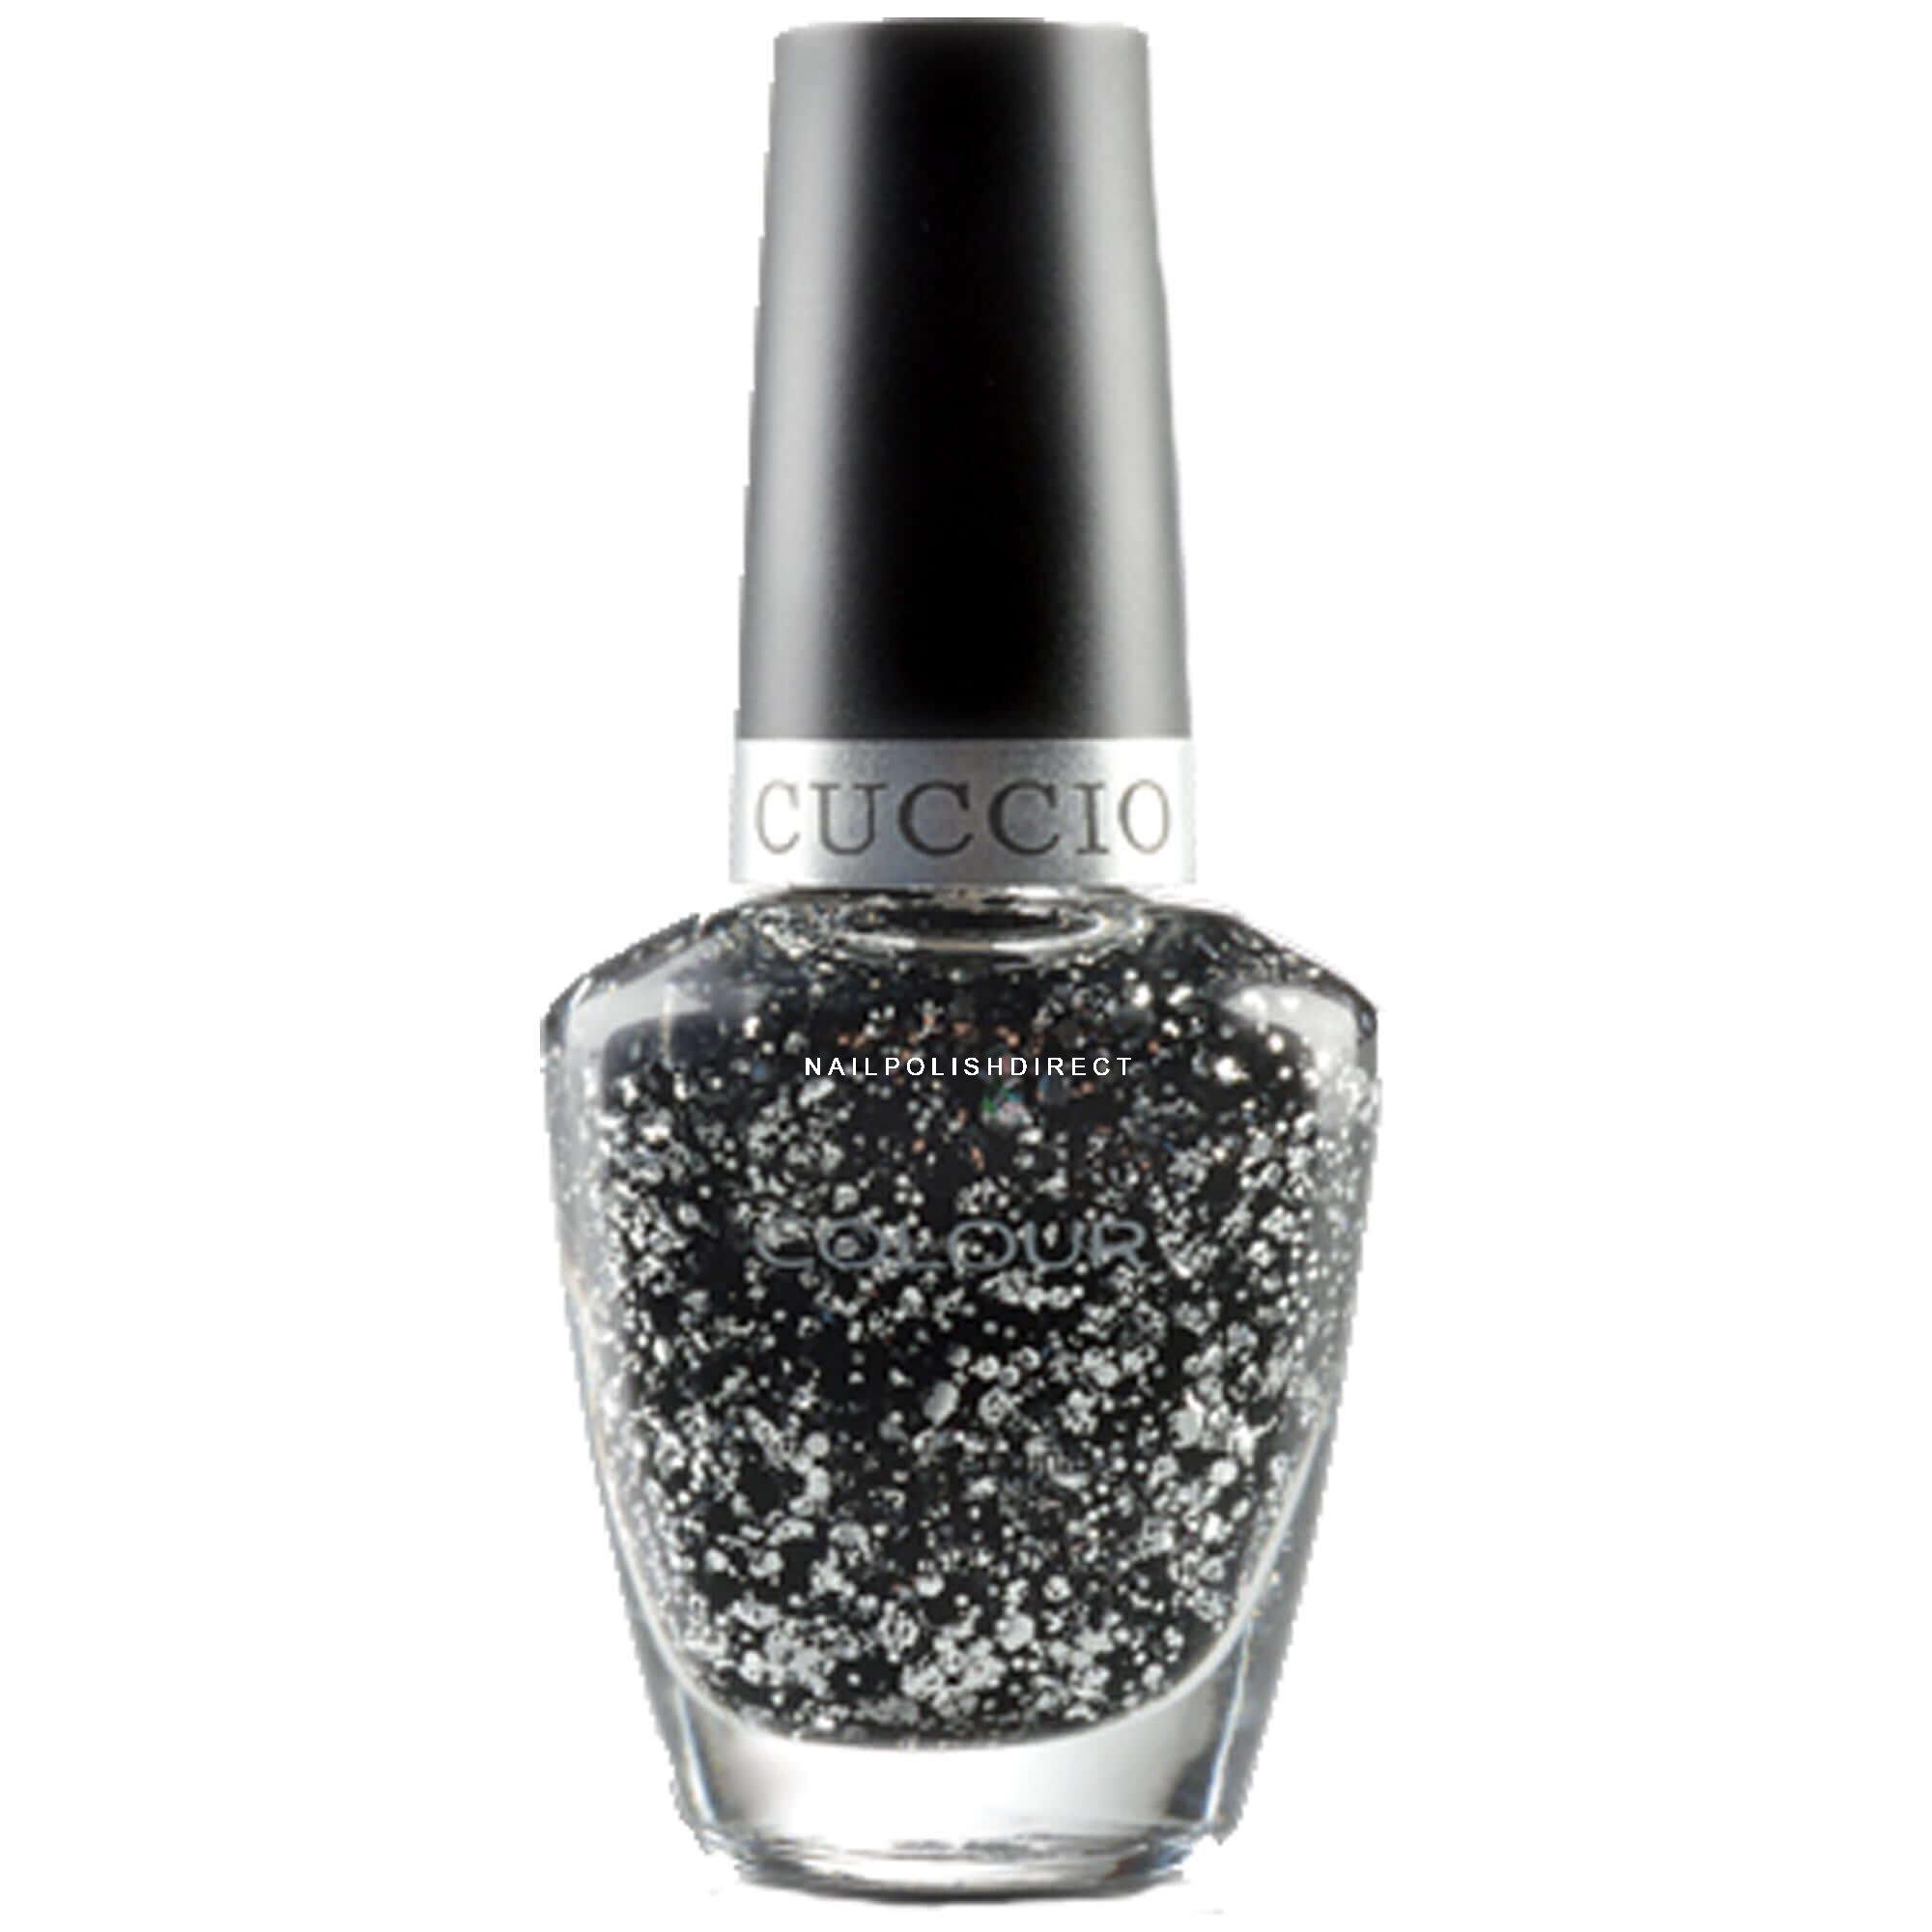 Cuccio Nail Polish - Experimental Colour 13ml   Professional Quality